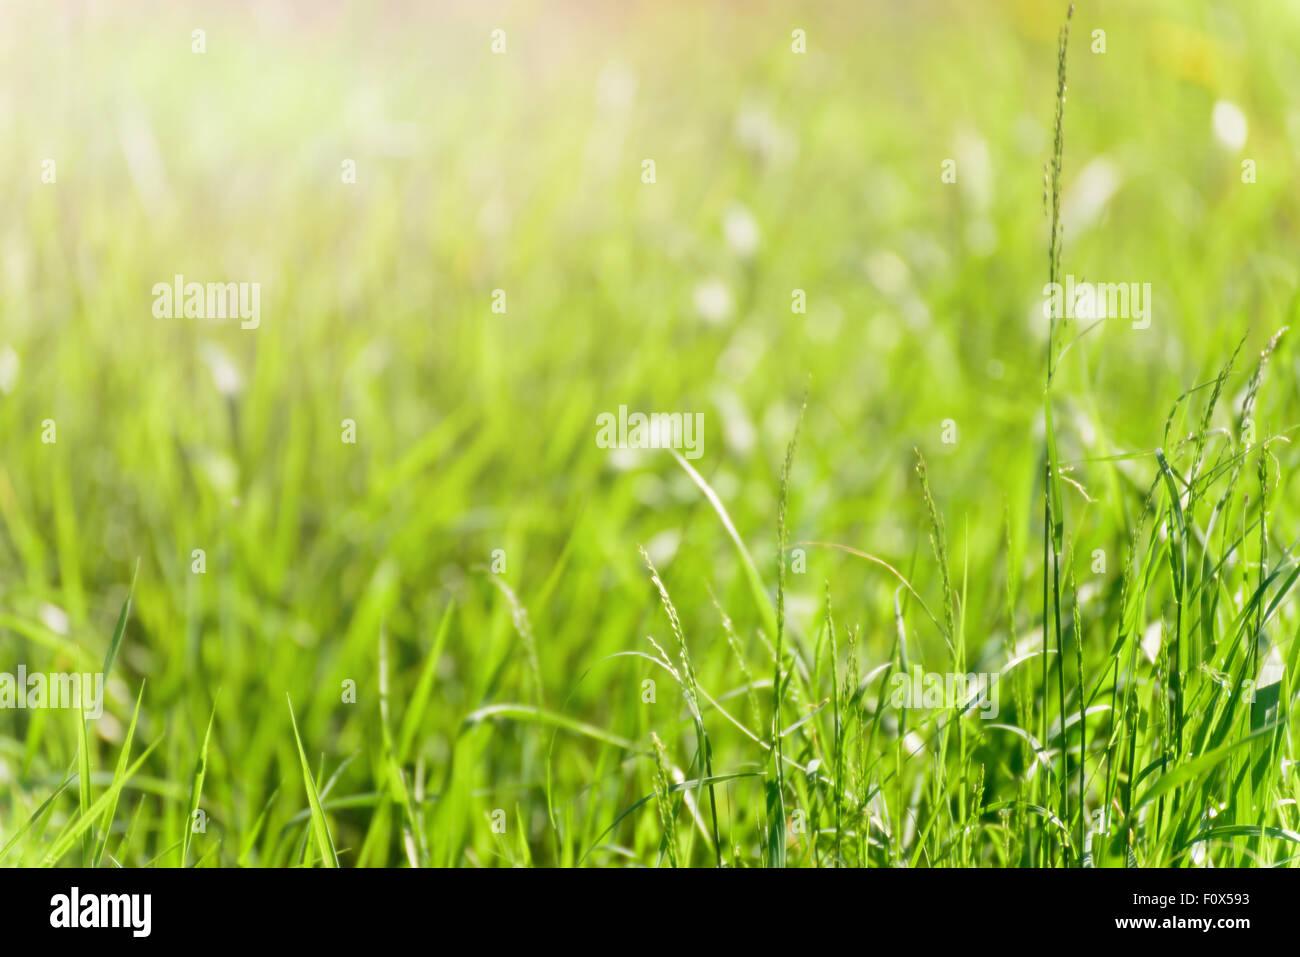 soft blur green grass background - Stock Image